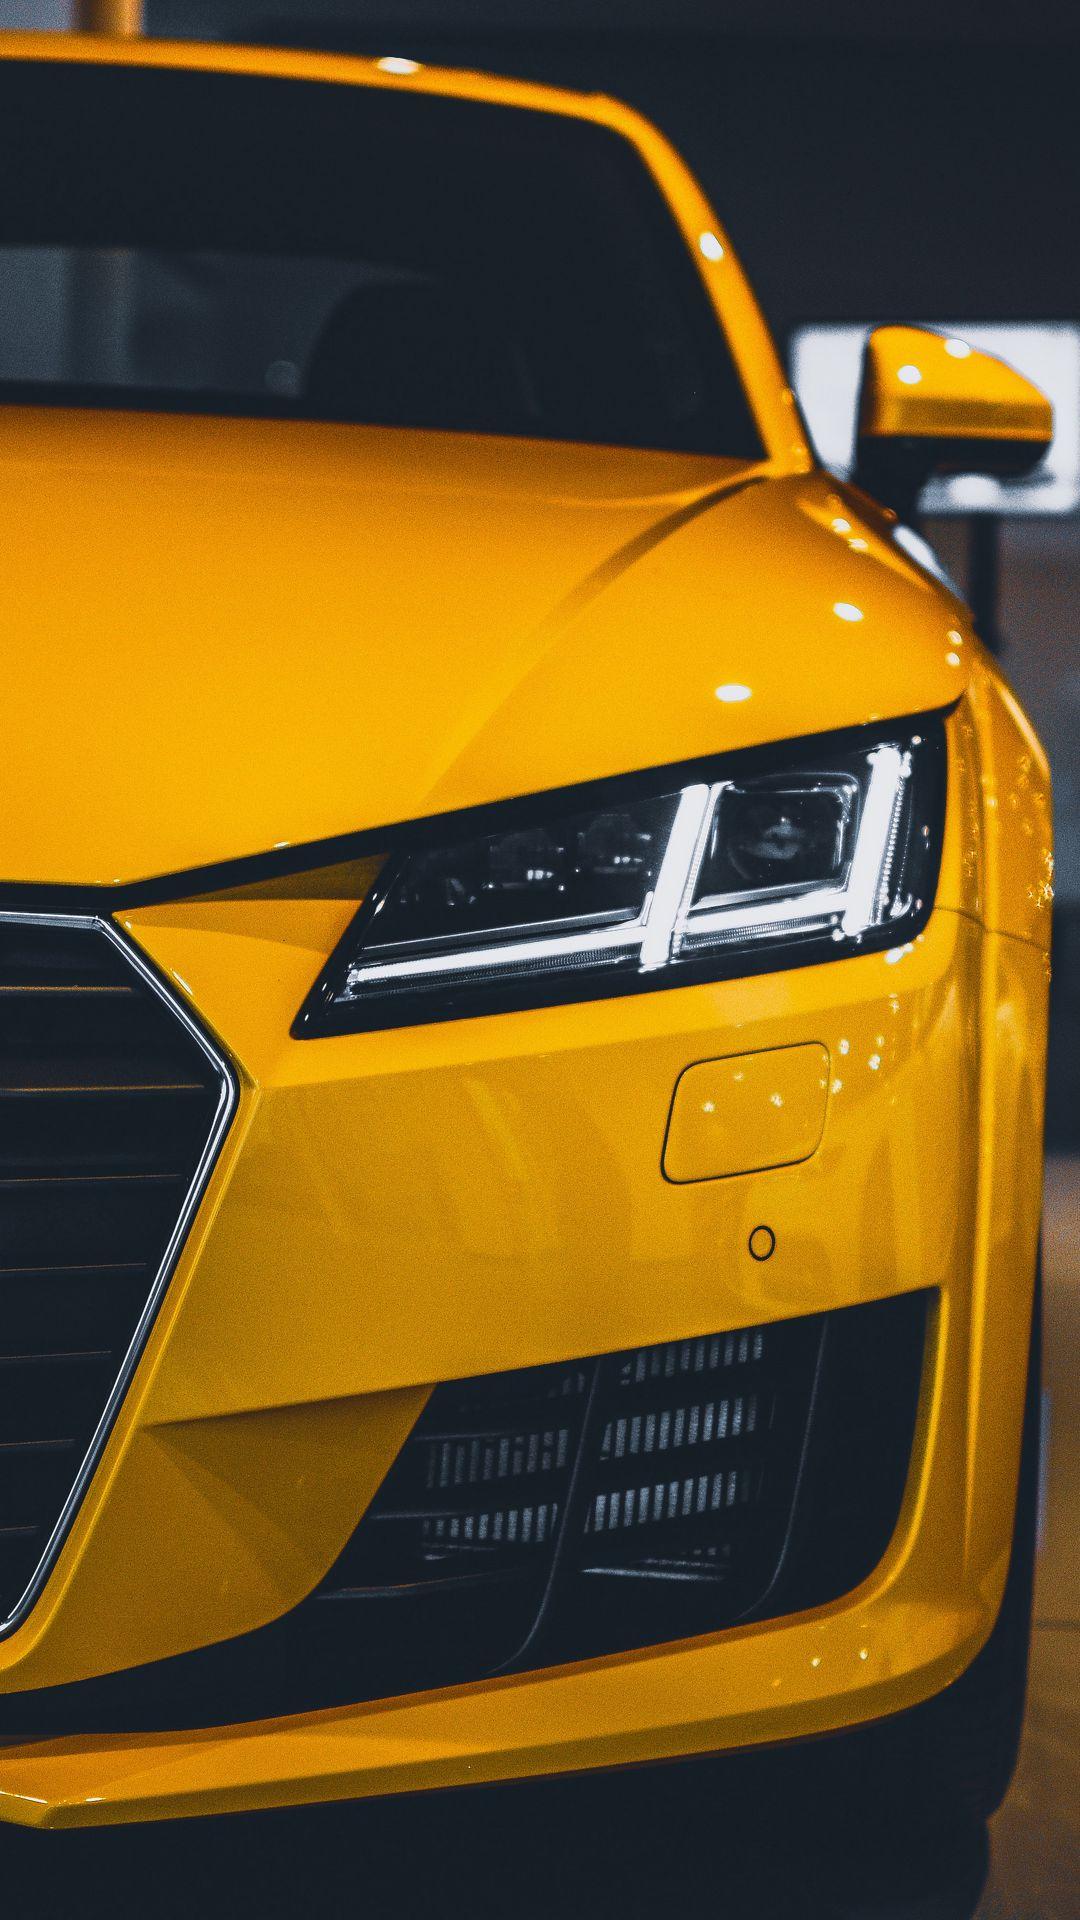 Audi TT Wallpapers Free Download